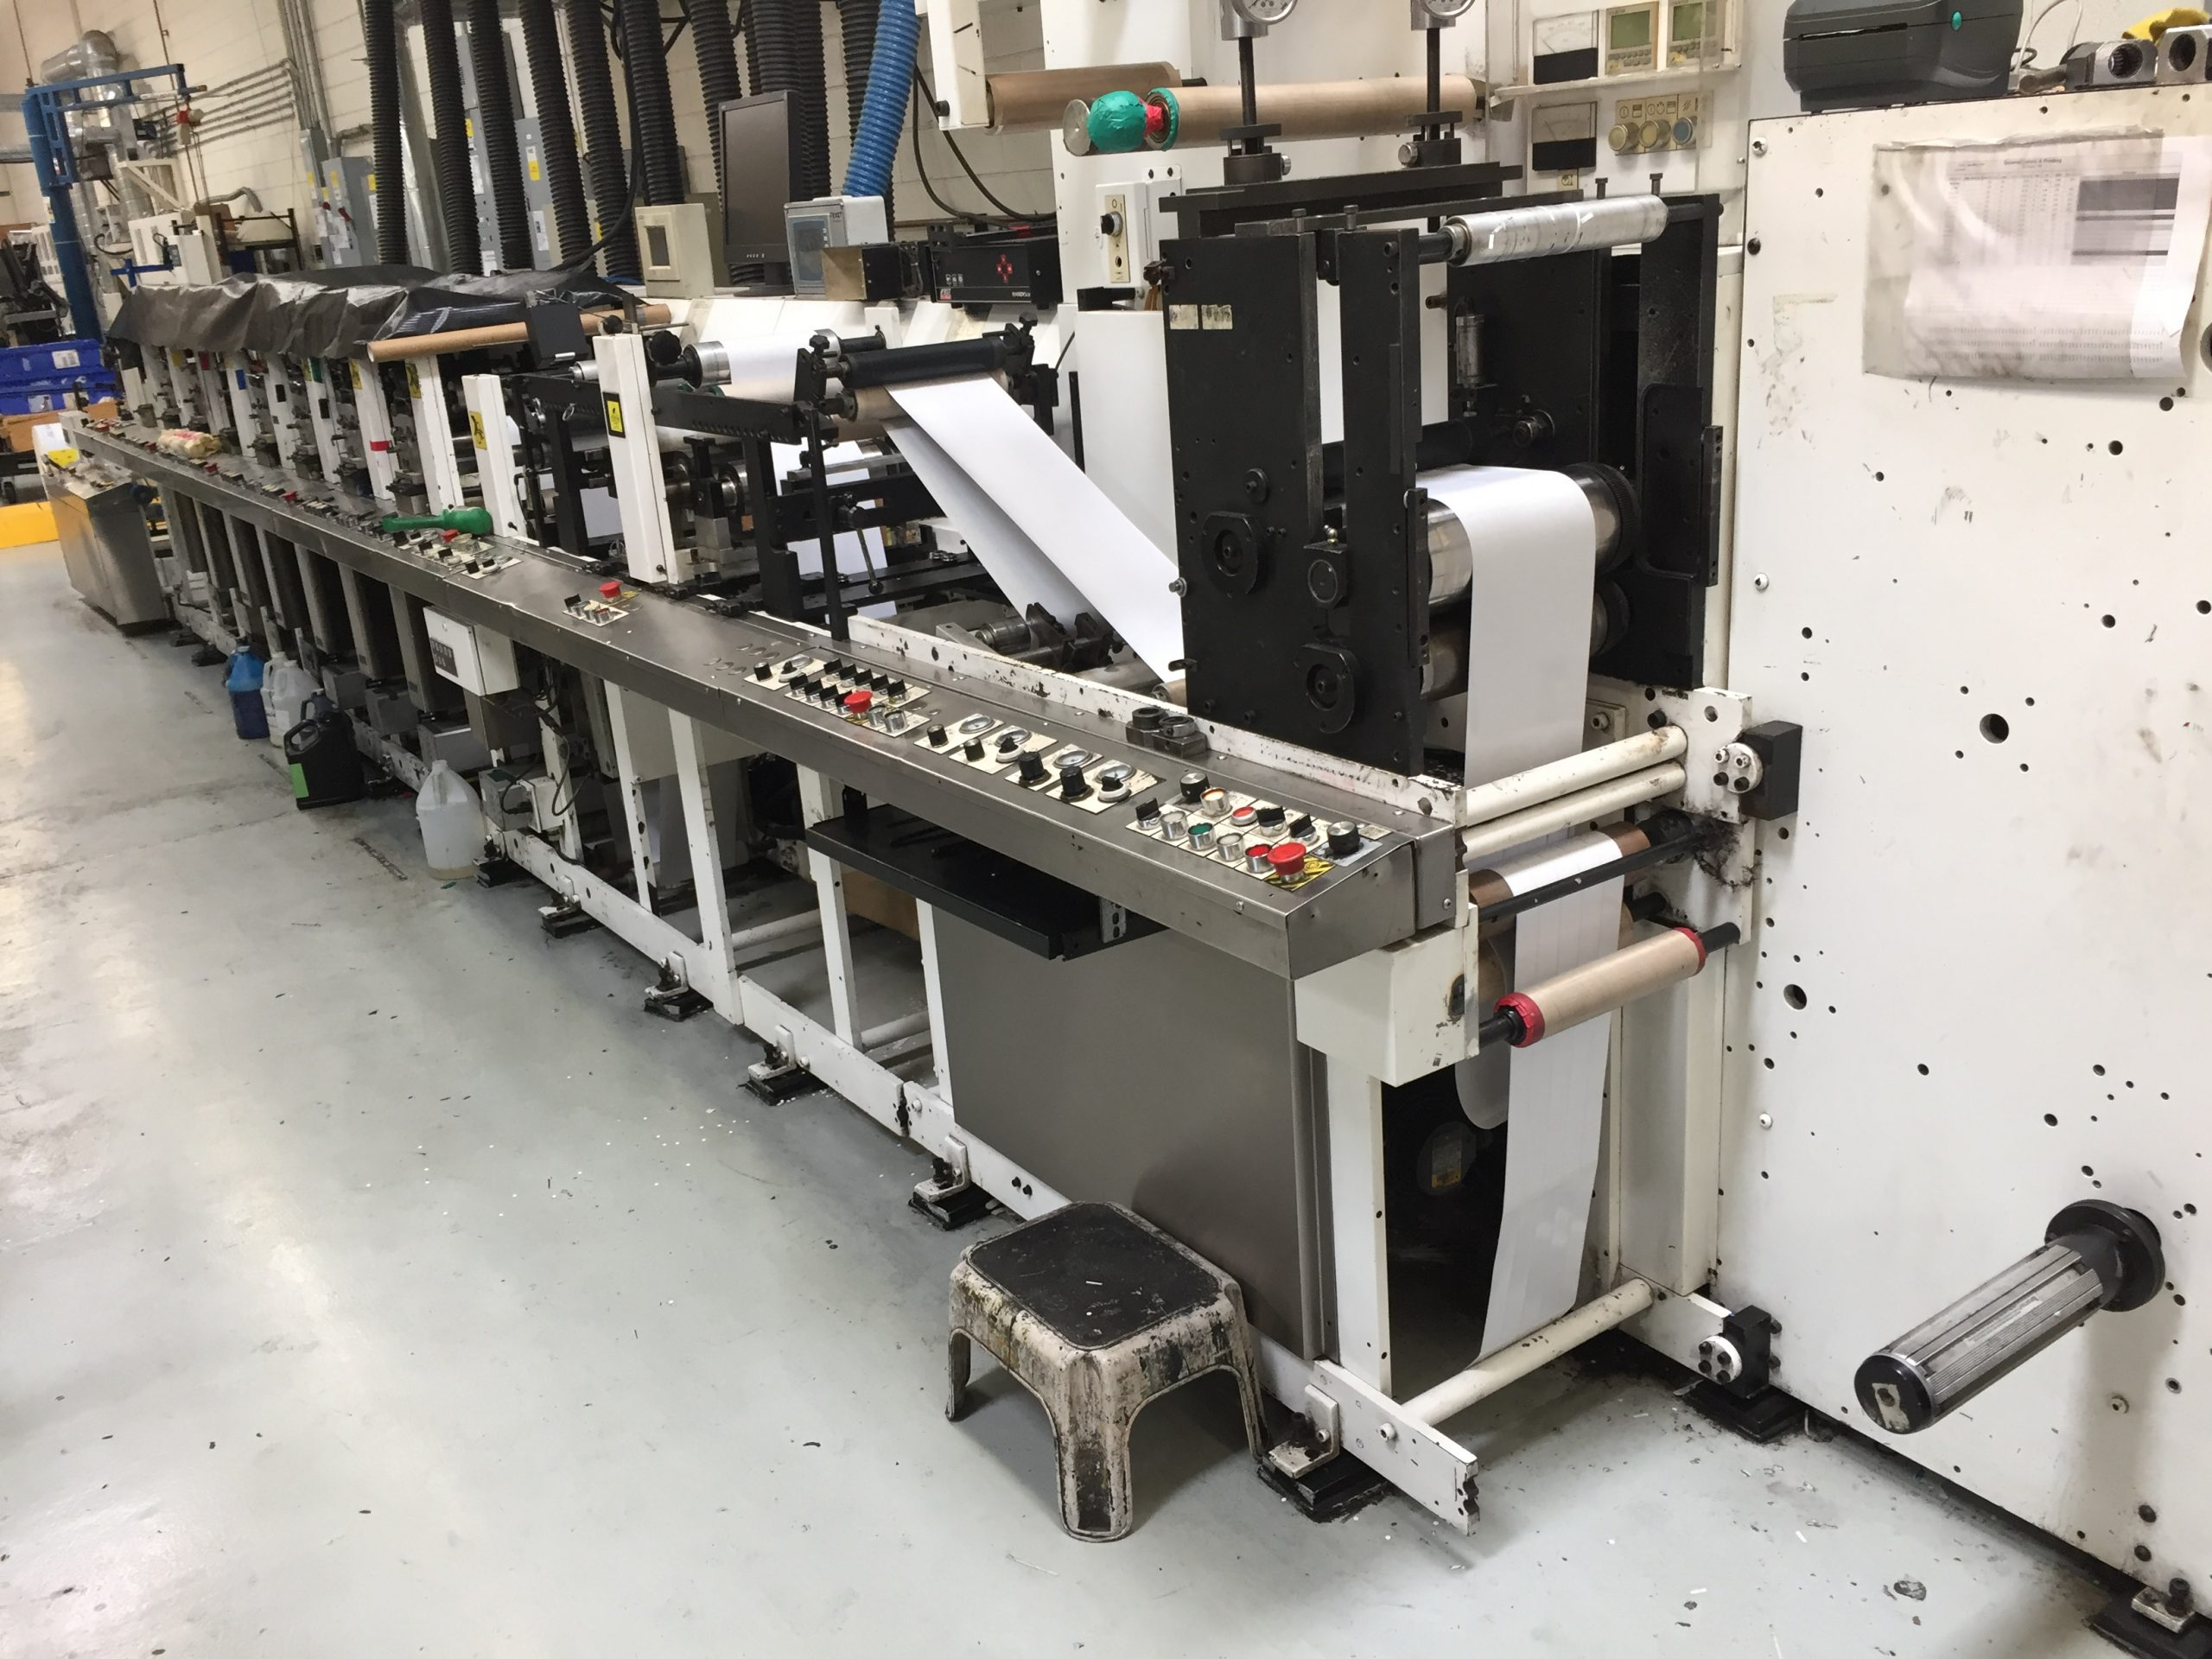 Aquaflex LCQXX-1008 - Used Flexo Printing Presses and Used Flexographic Equipment-5